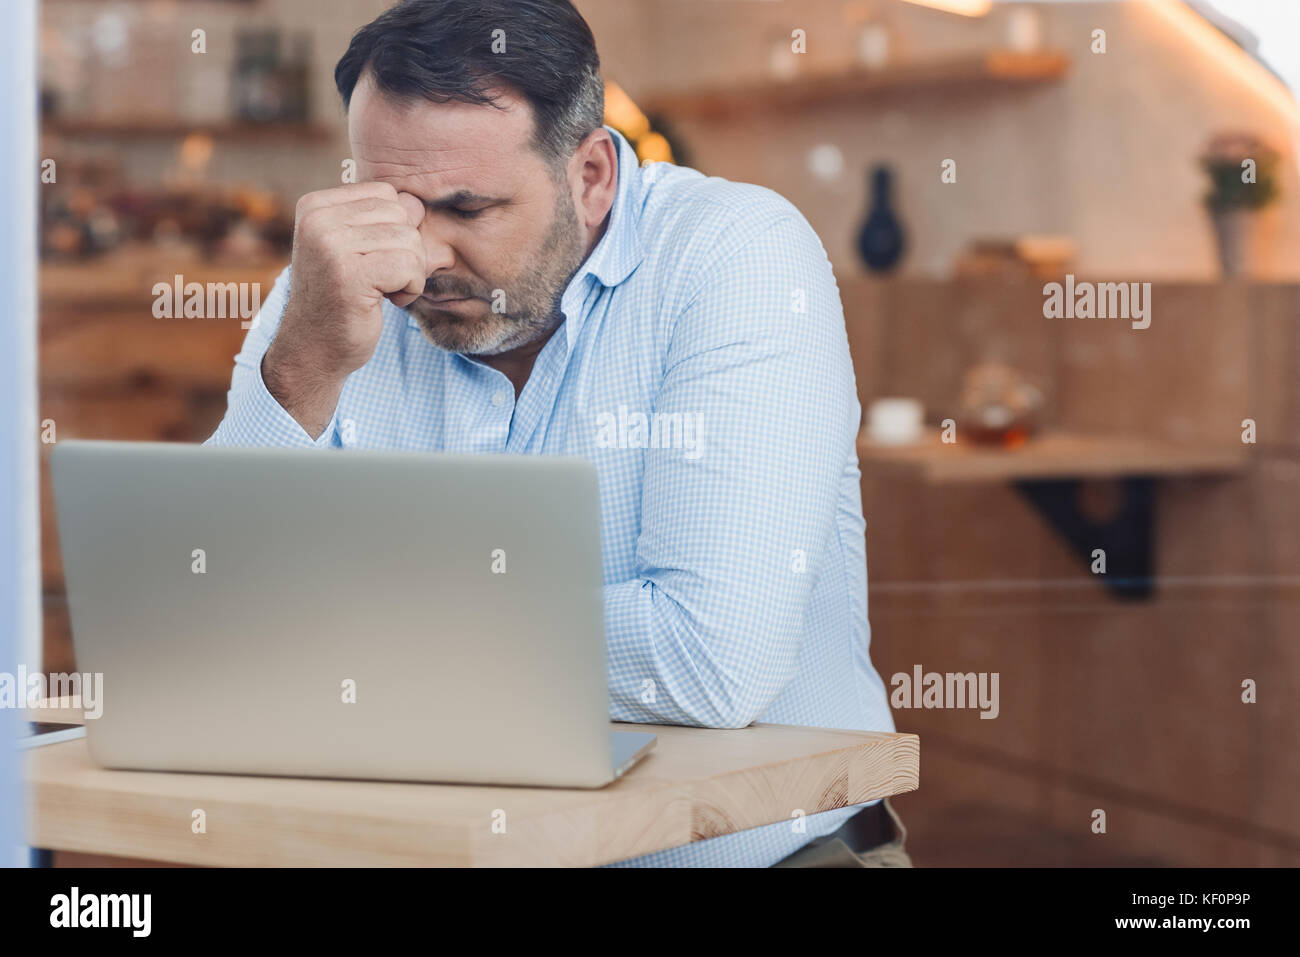 depressed businessman with laptop - Stock Image